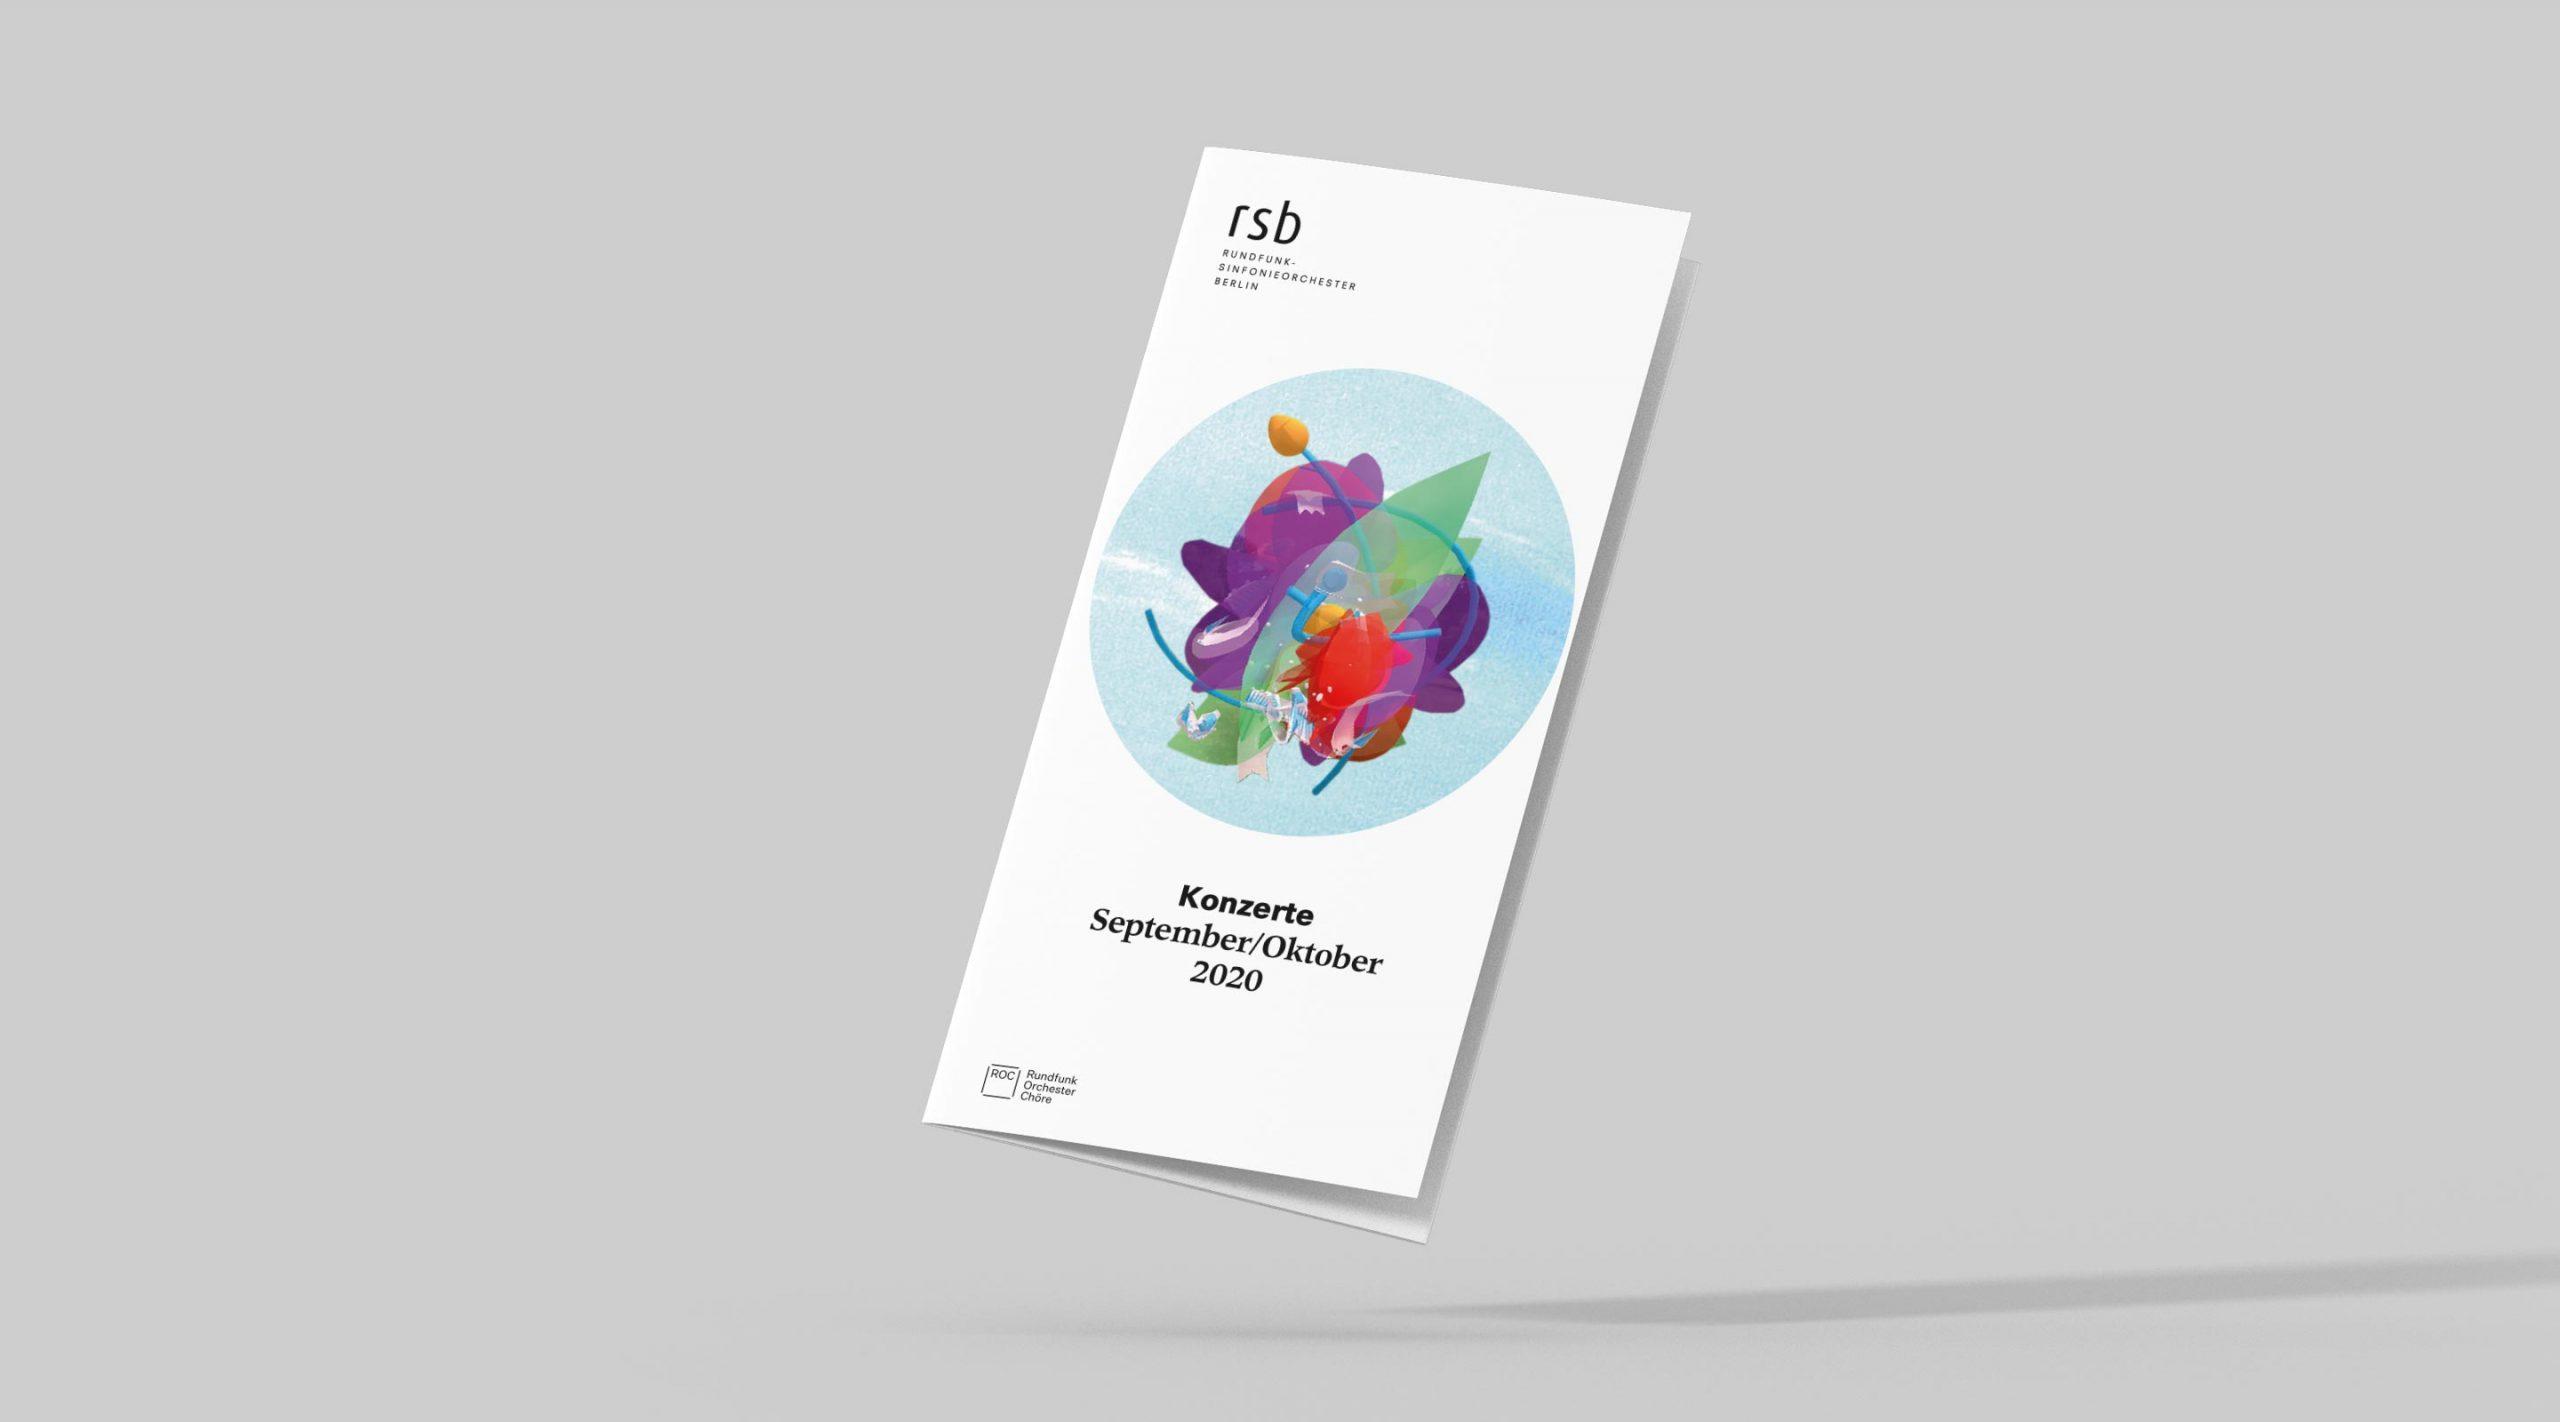 rsb Saison Motiv Konzertflyer Cover – Uthmöller und Partner